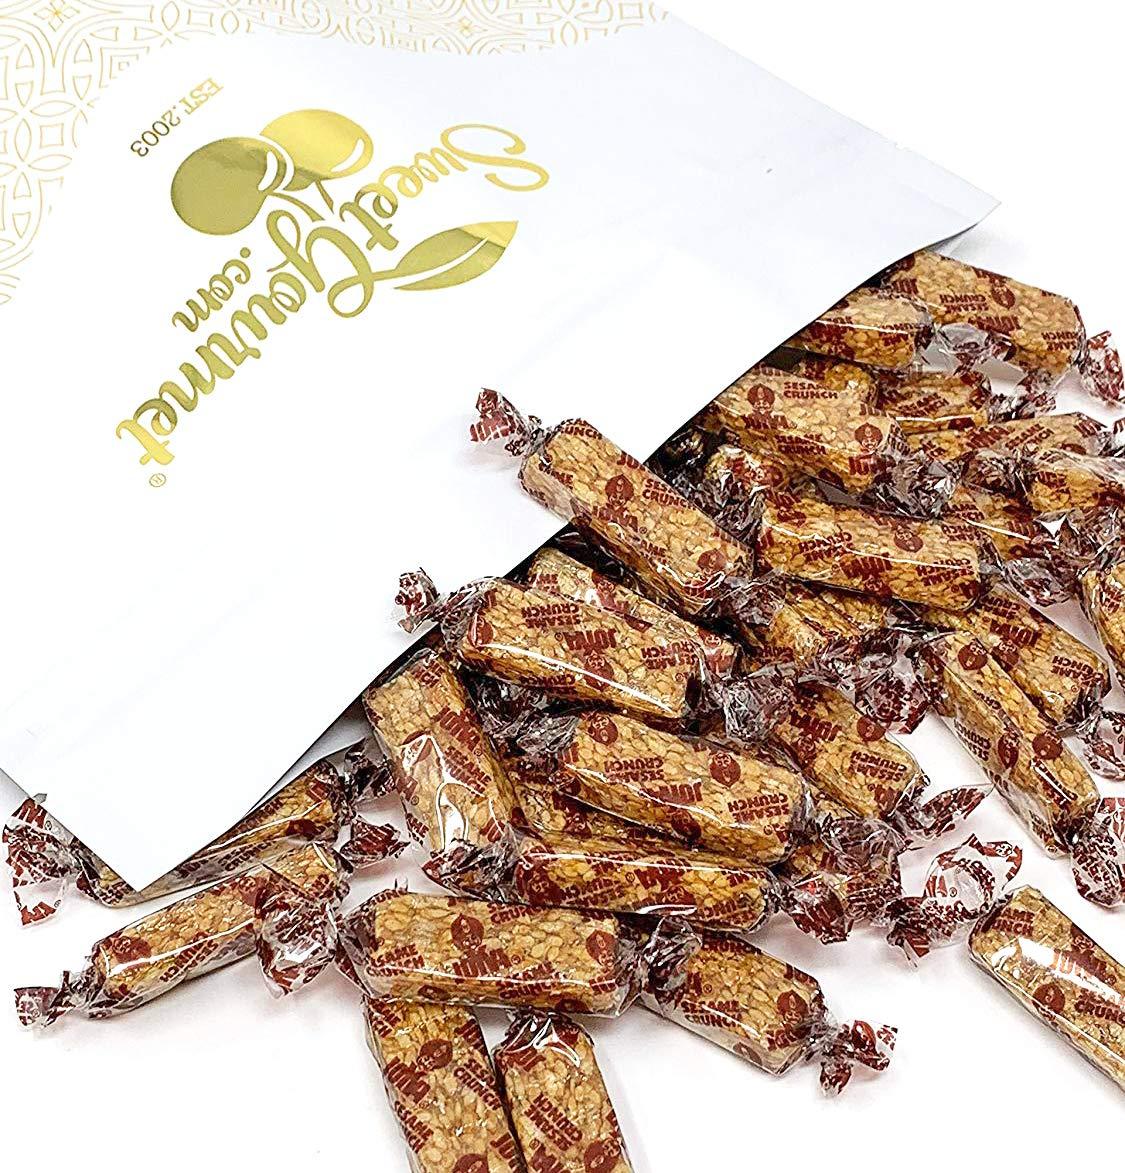 Joyva Sesame Honey Crunch - all natural, kosher candy 3 pounds by SweetGourmet